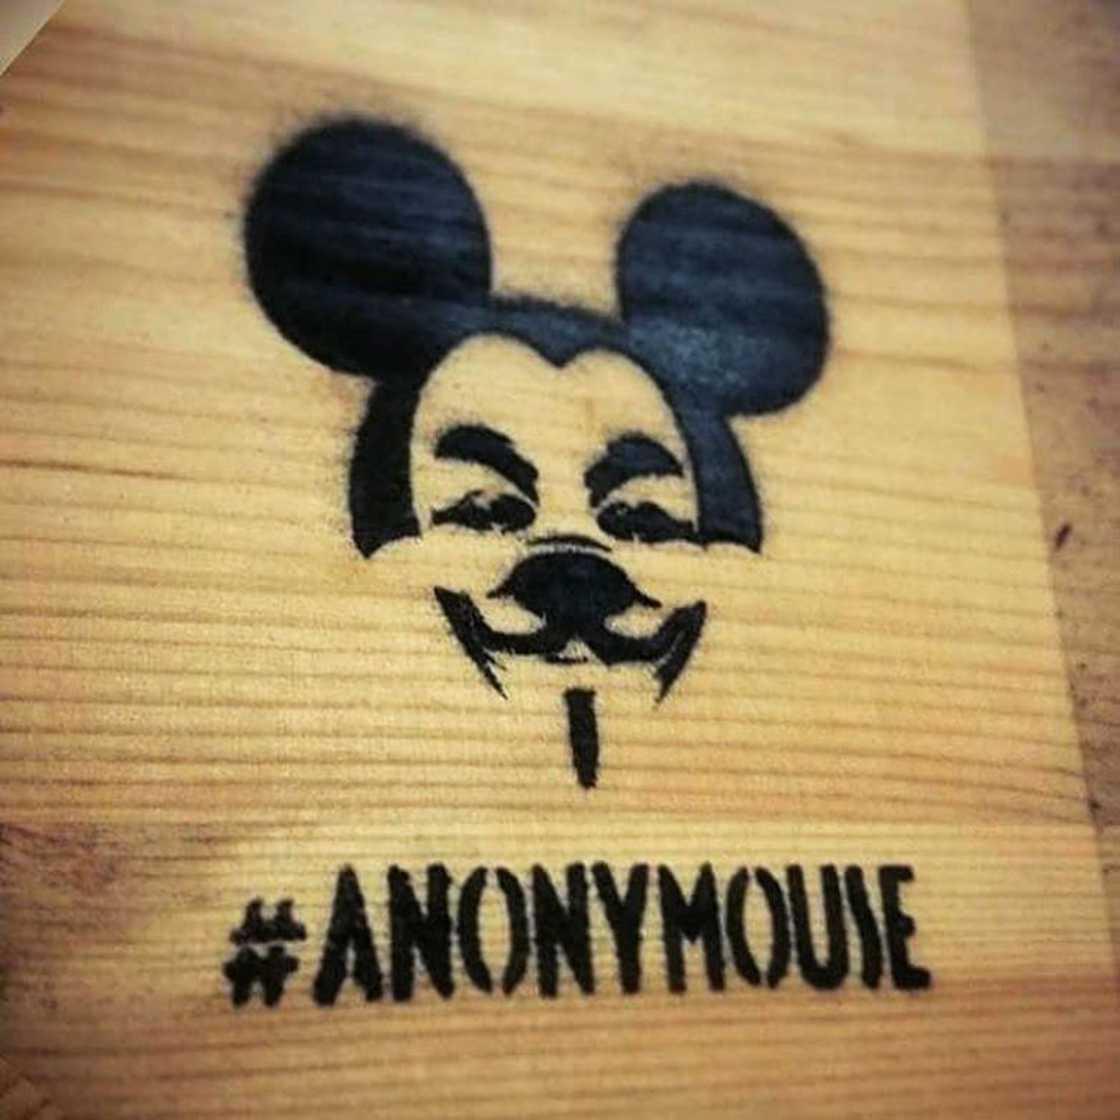 anonymouse-tiendas-en-miniatura-mis-gafas-de-pasta19